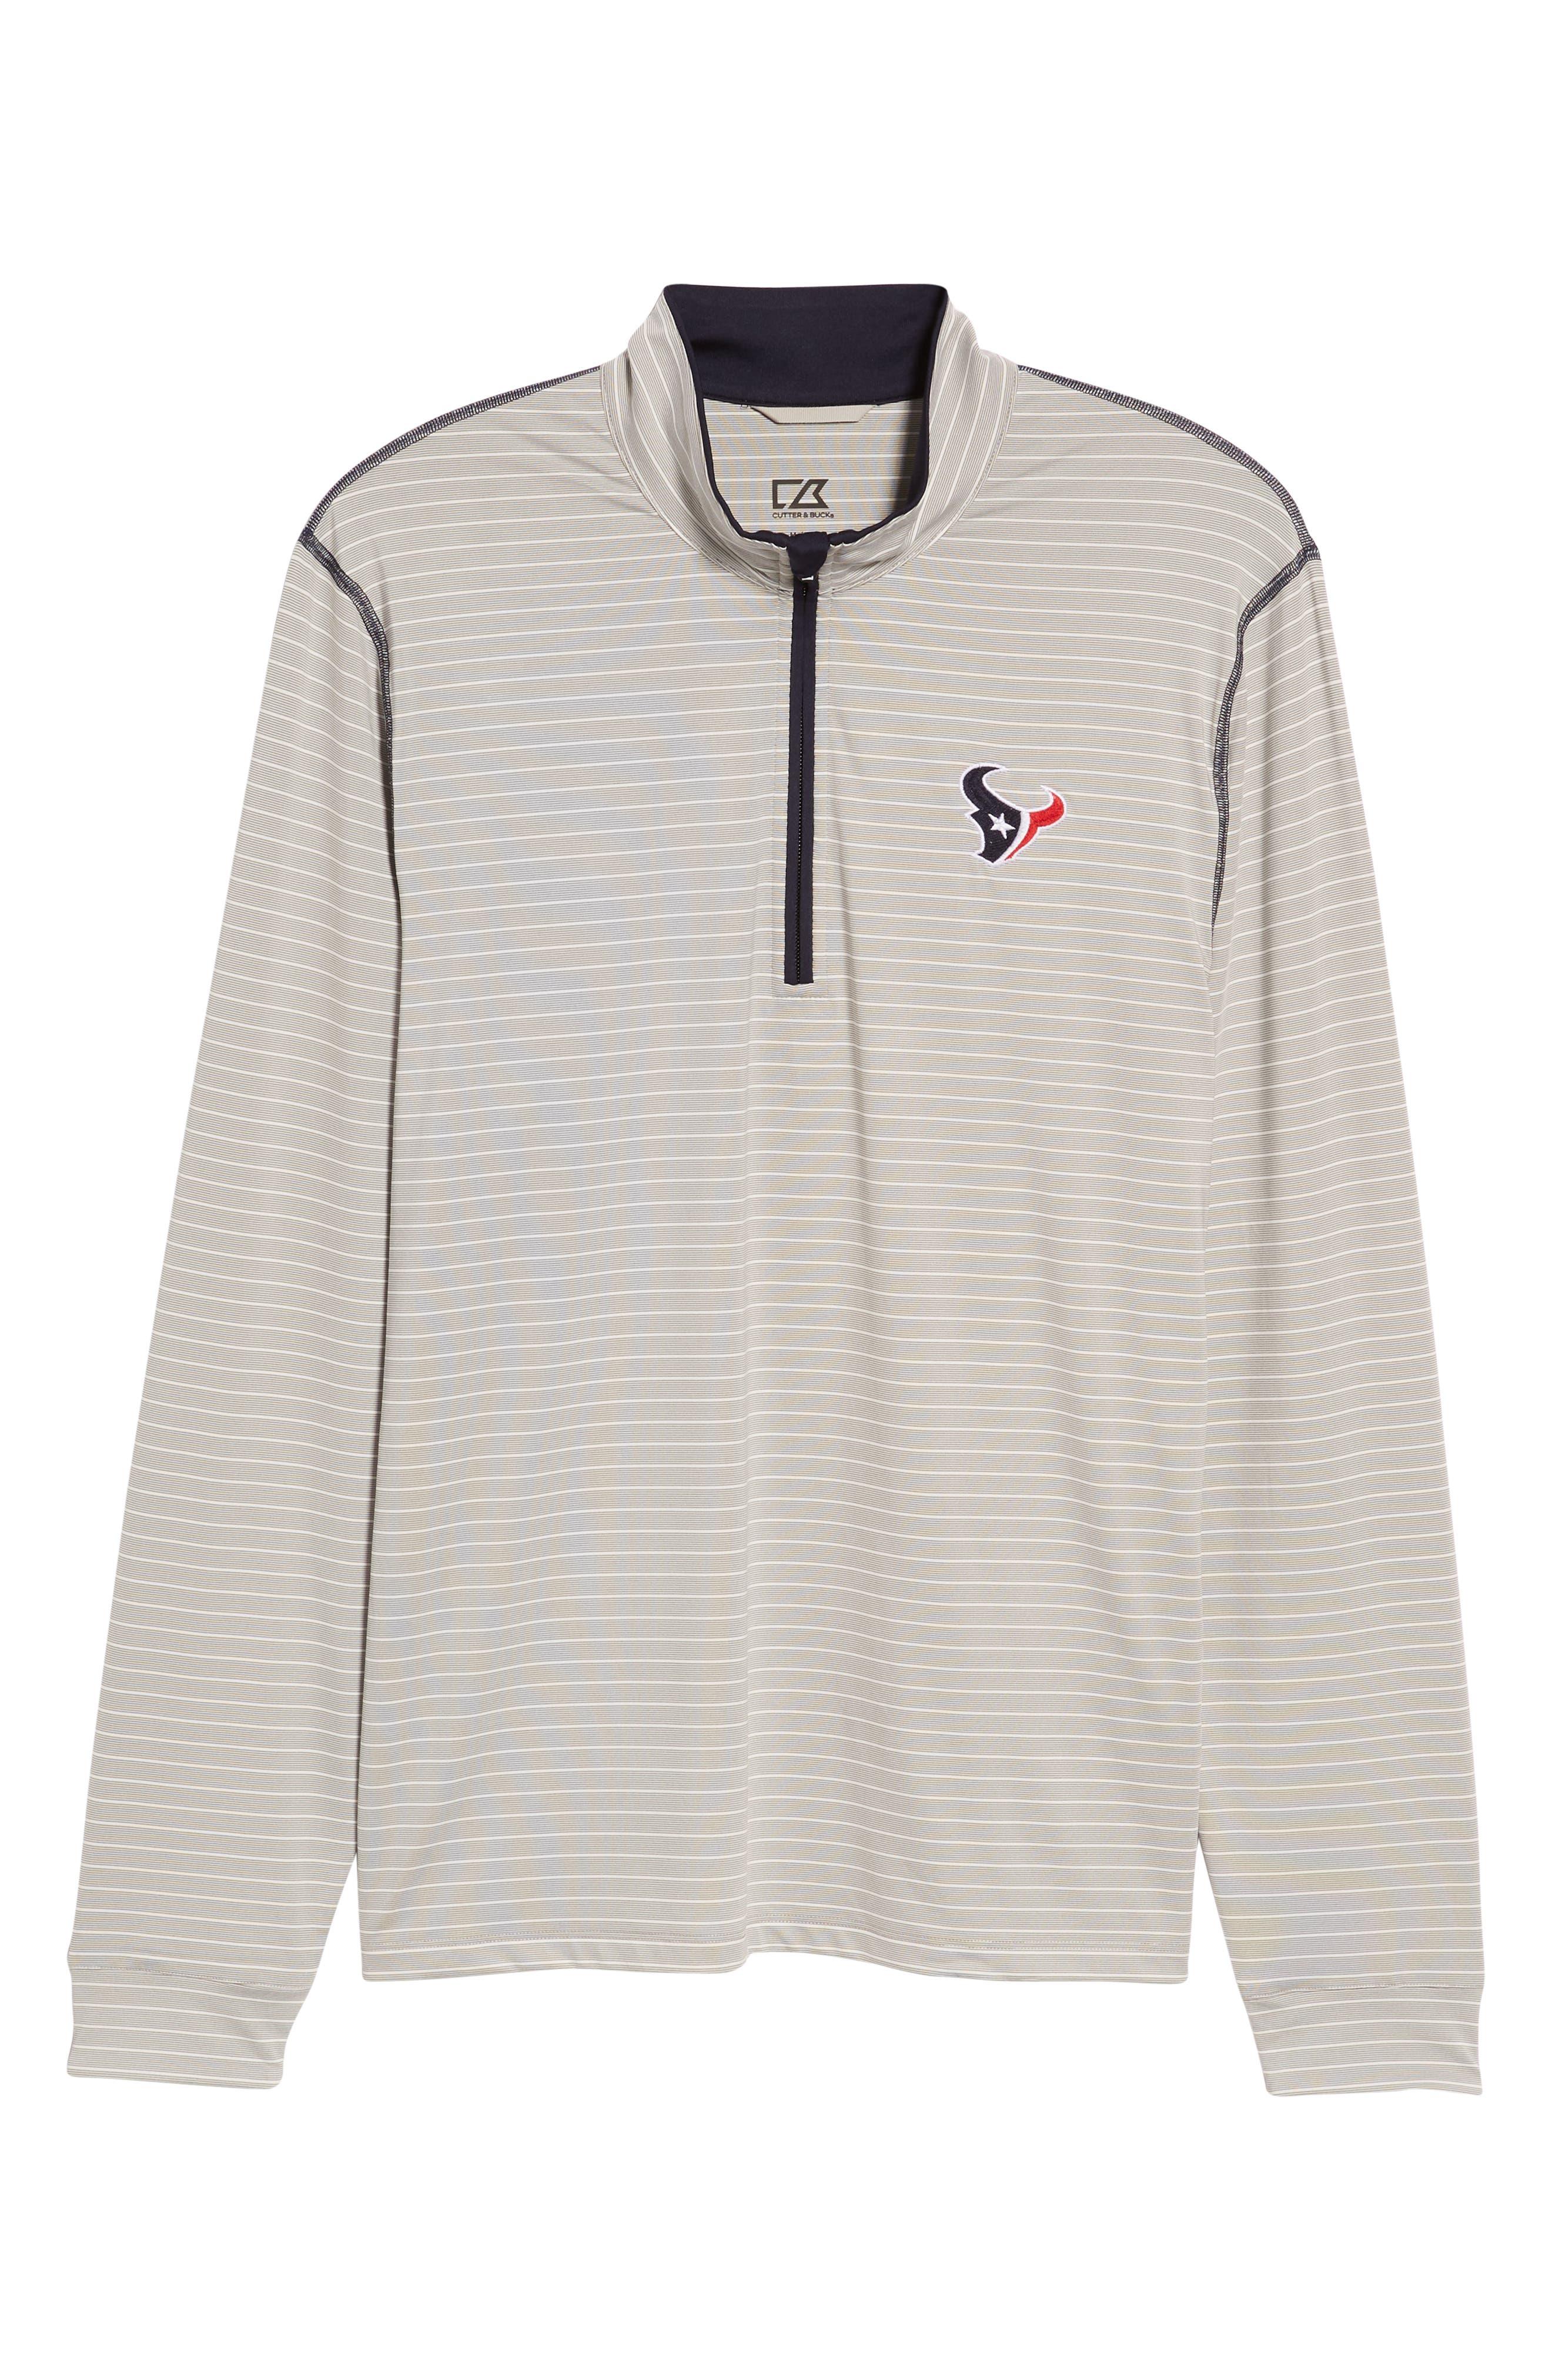 Meridian - Houston Texans Regular Fit Half Zip Pullover,                             Alternate thumbnail 6, color,                             NAVY